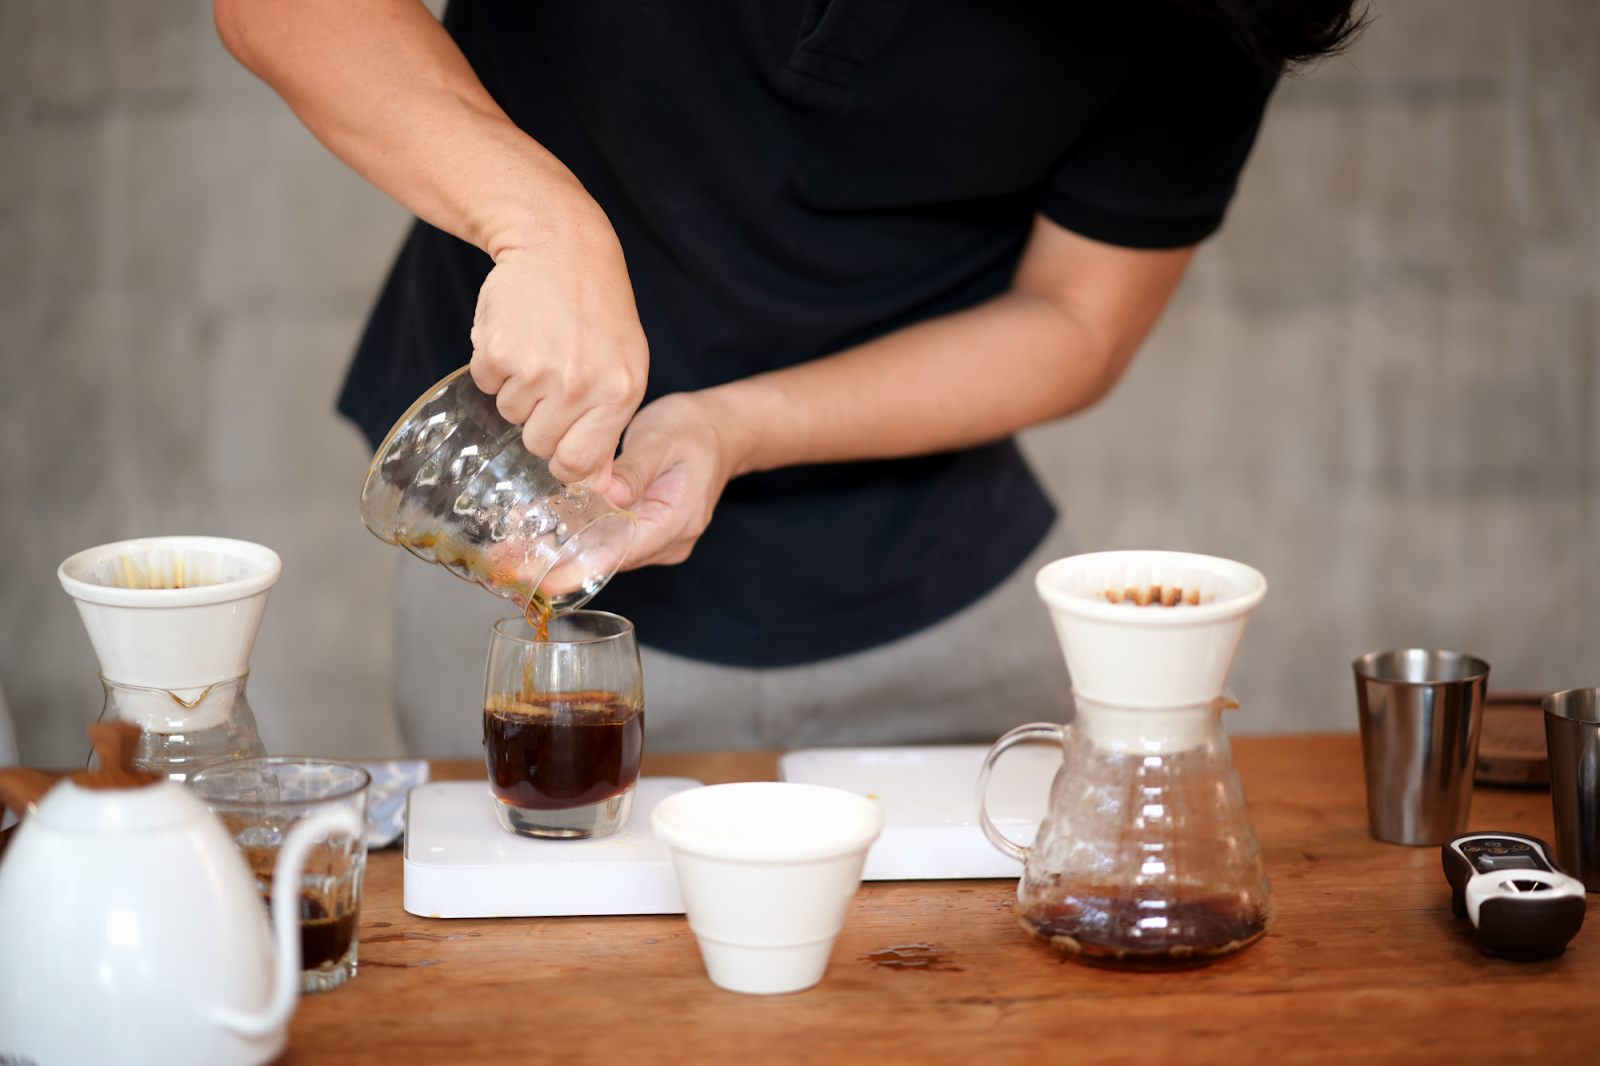 barista dripping coffee